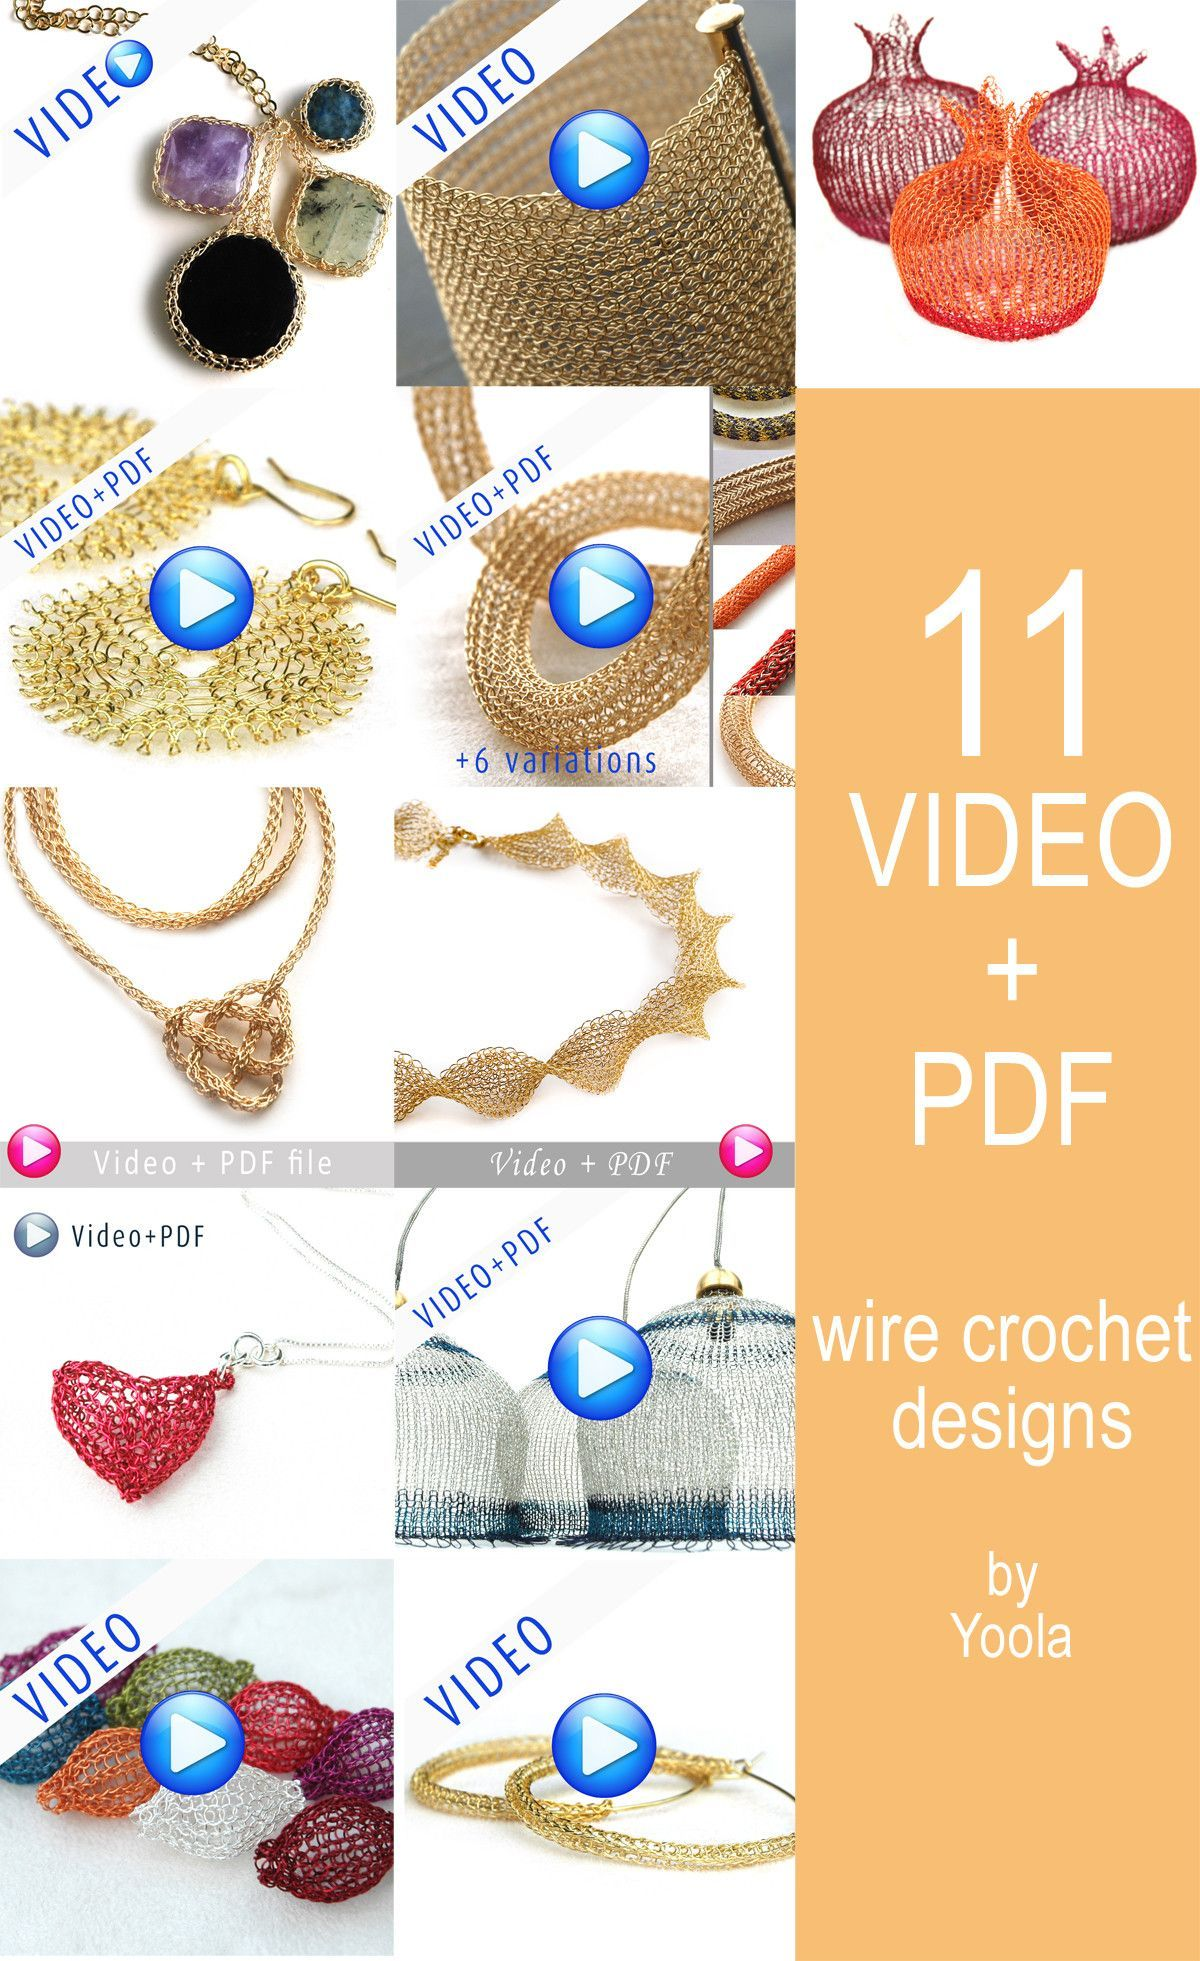 jewelry pattern yoolatube PDF pattern tutorial ebook step by step instructions Crochet pattern of a wire crochet Necklace